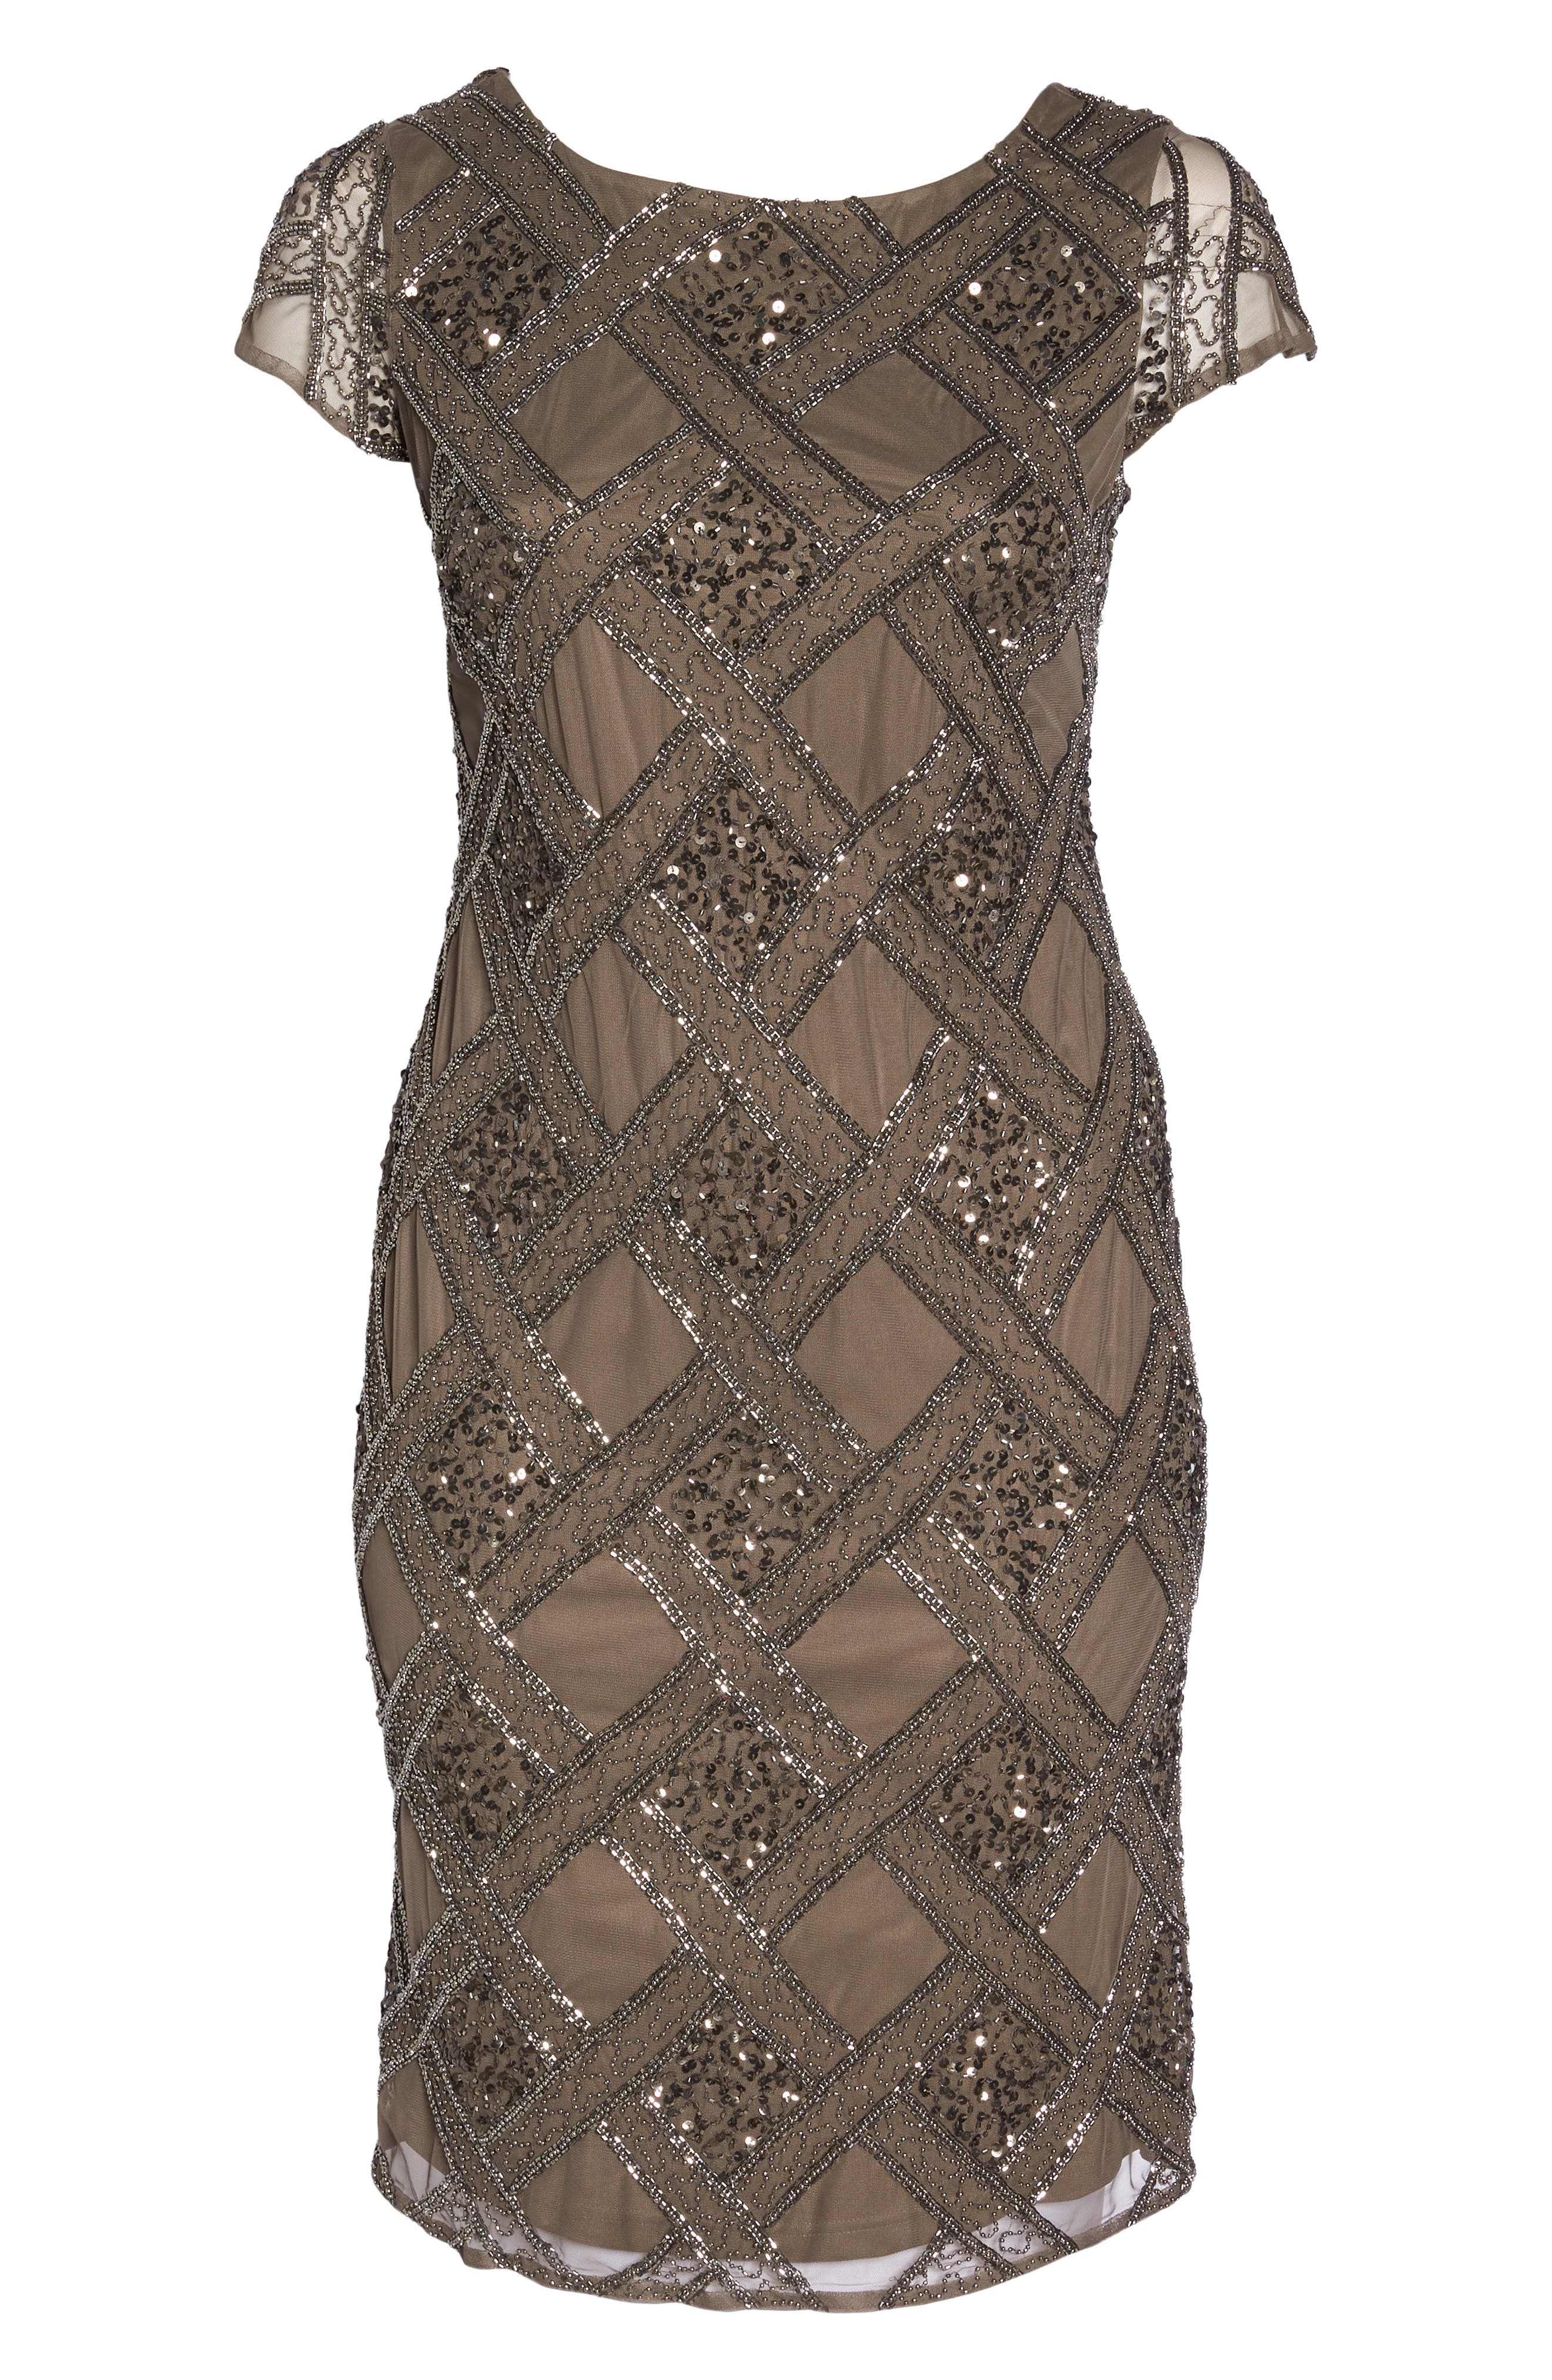 ADRIANNA PAPELL,                             Beaded Cap Sleeve Sheath Dress,                             Alternate thumbnail 6, color,                             050